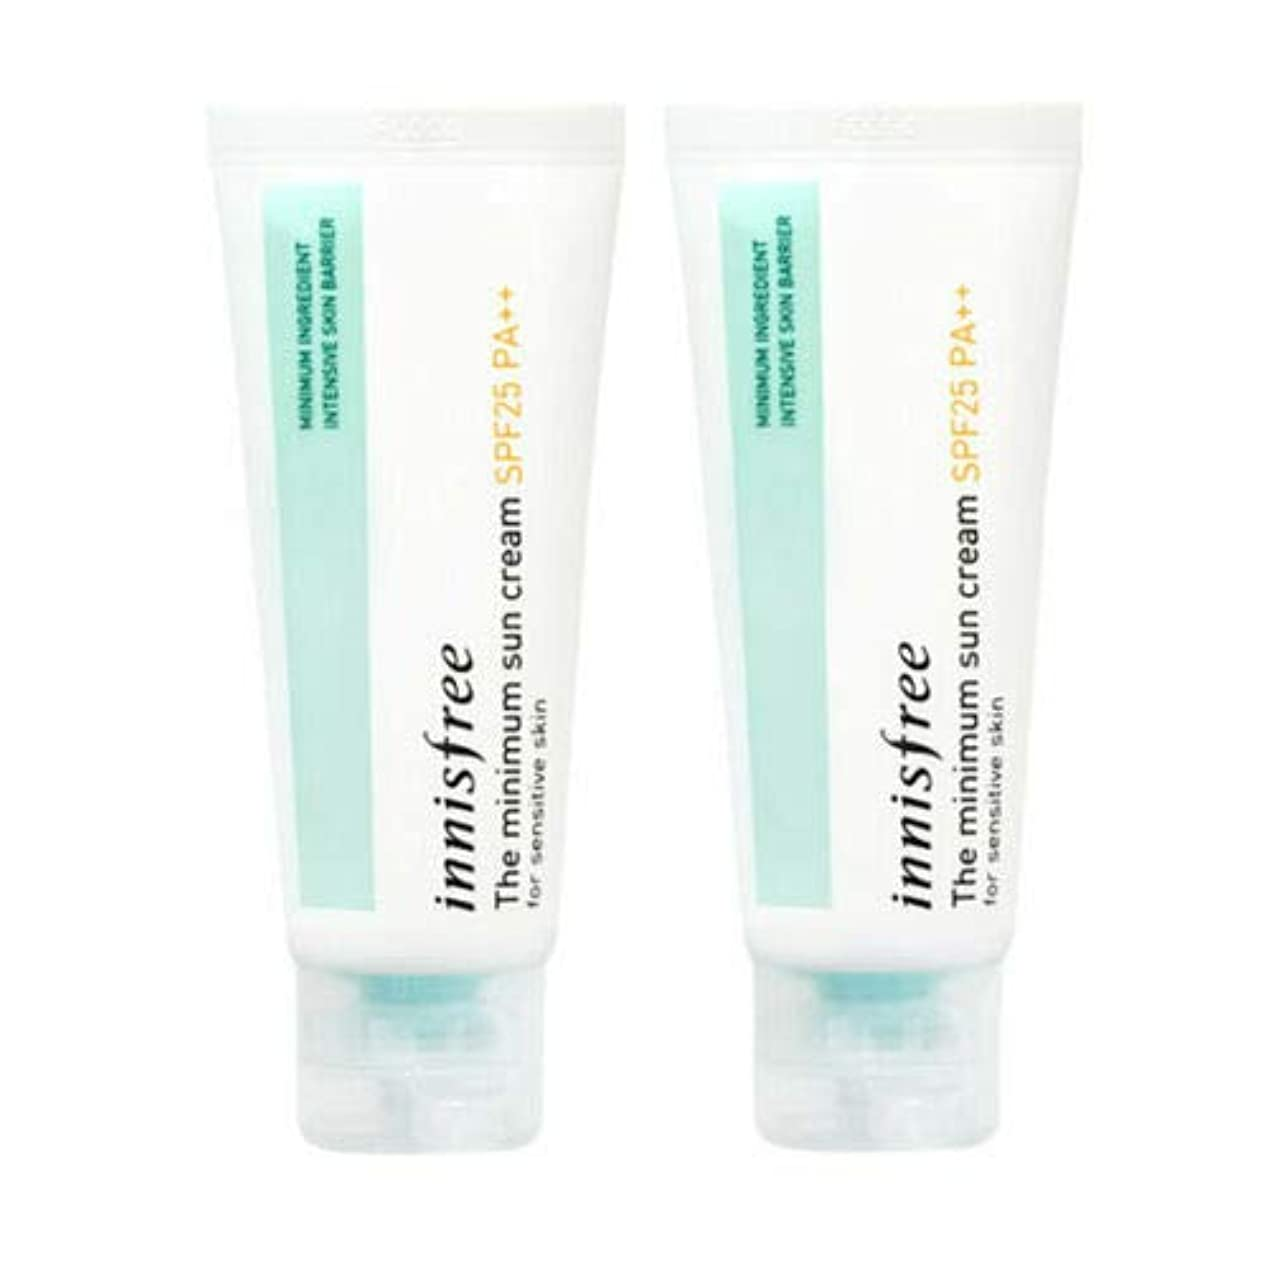 [1+1] Innisfree イニスフリー ザ·ミニマムサンクリーム 40ml SPF25/PA++ The Minimum Sun Cream